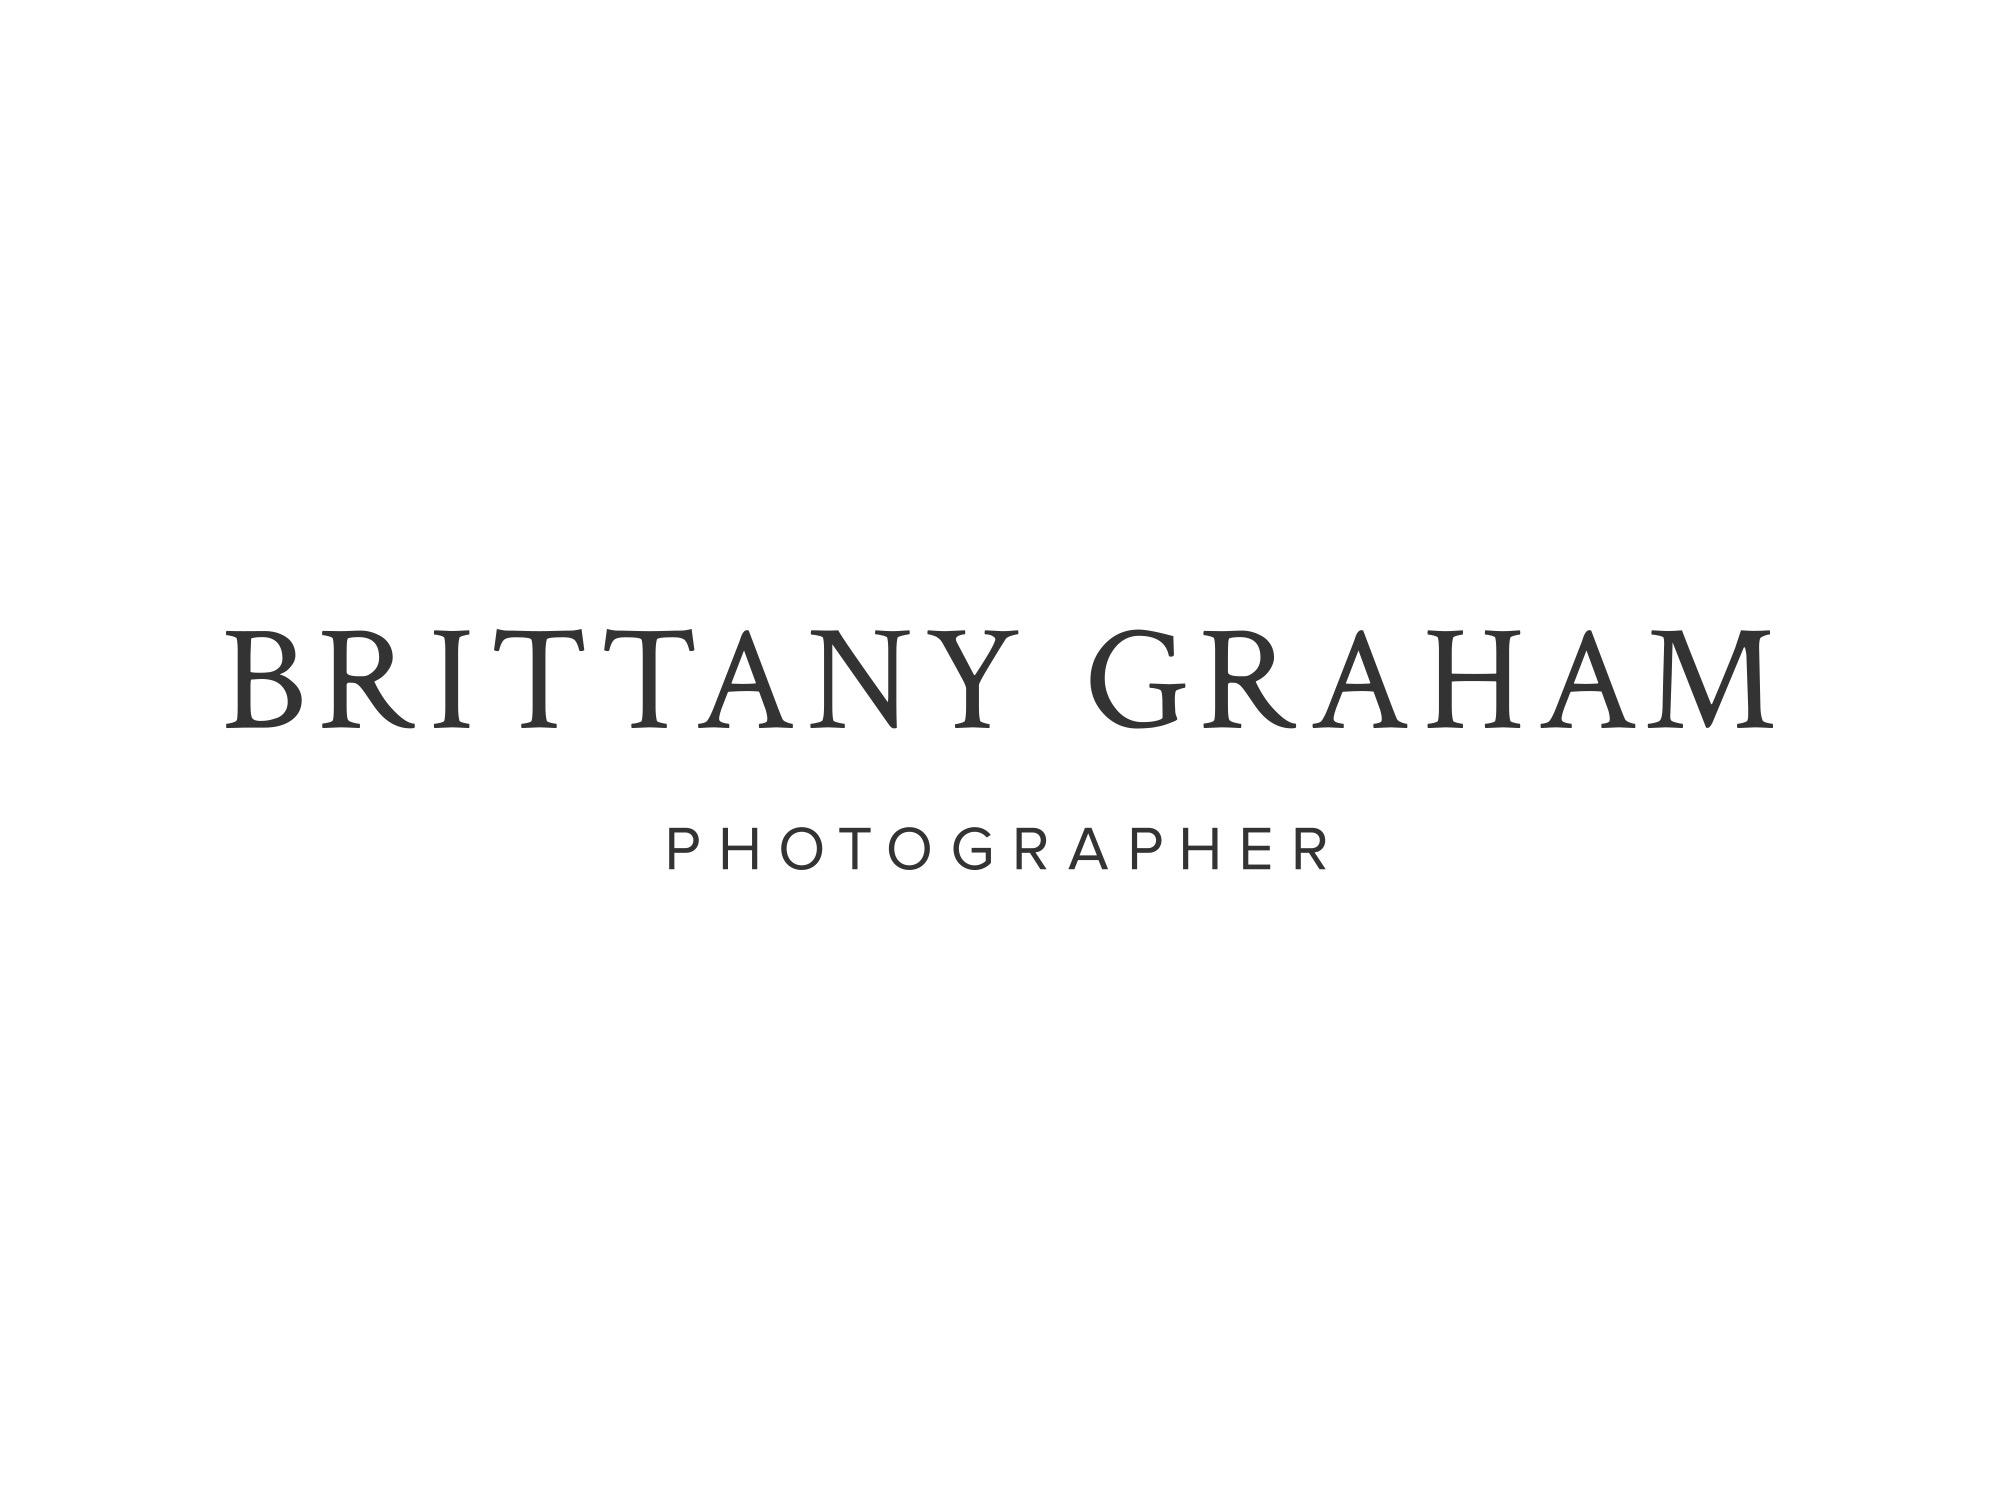 brittany-graham-logo.jpg